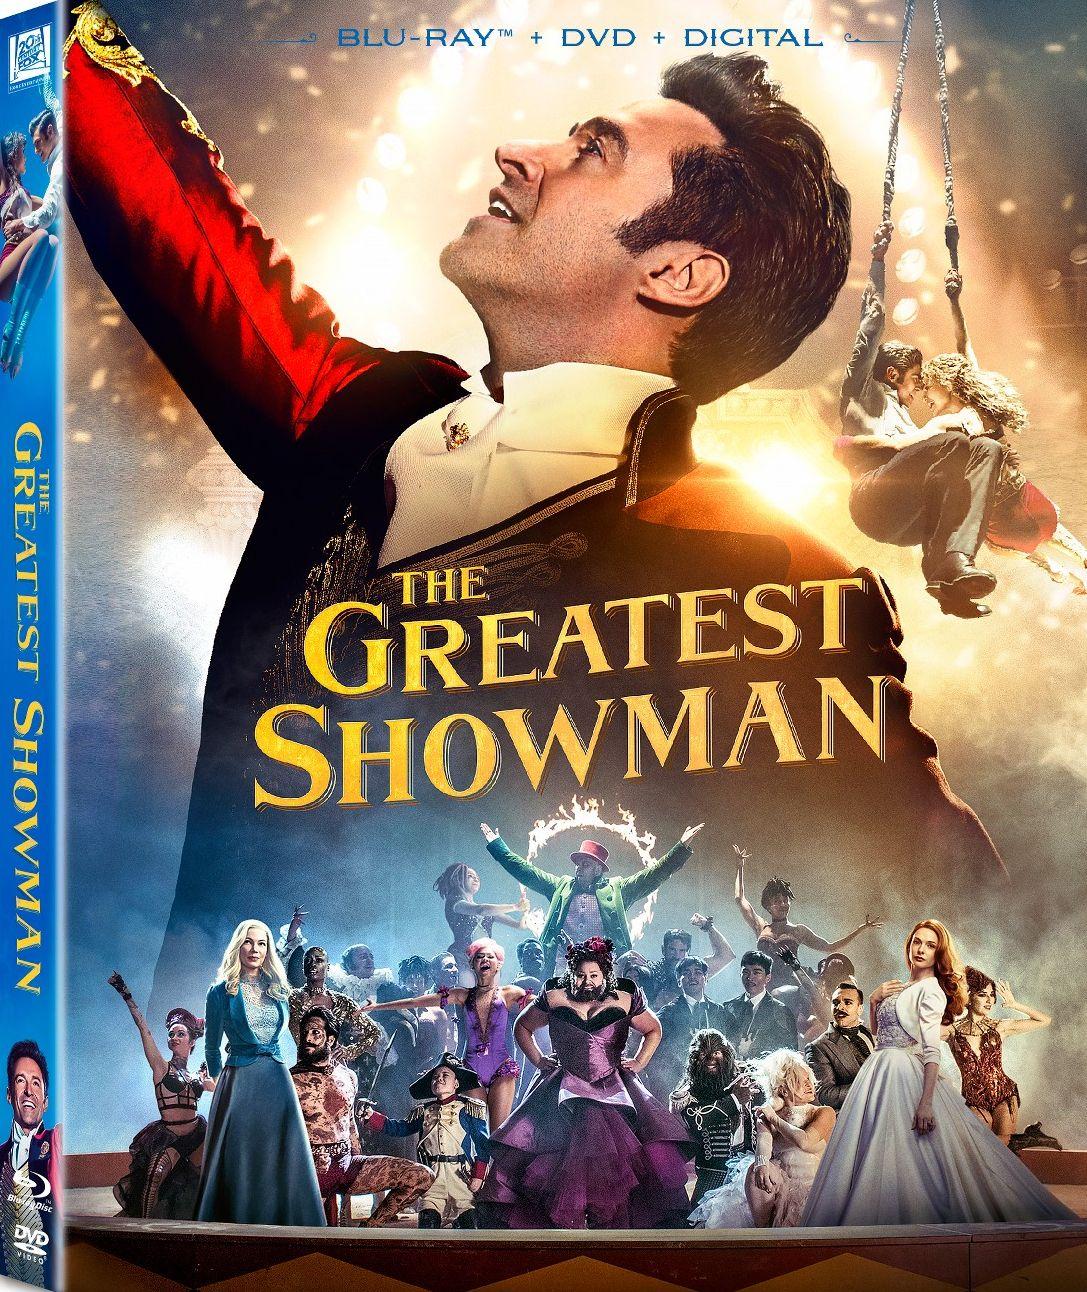 The Greatest Showman Blu Ray 20th Century Fox Showman Movie The Greatest Showman Greatful